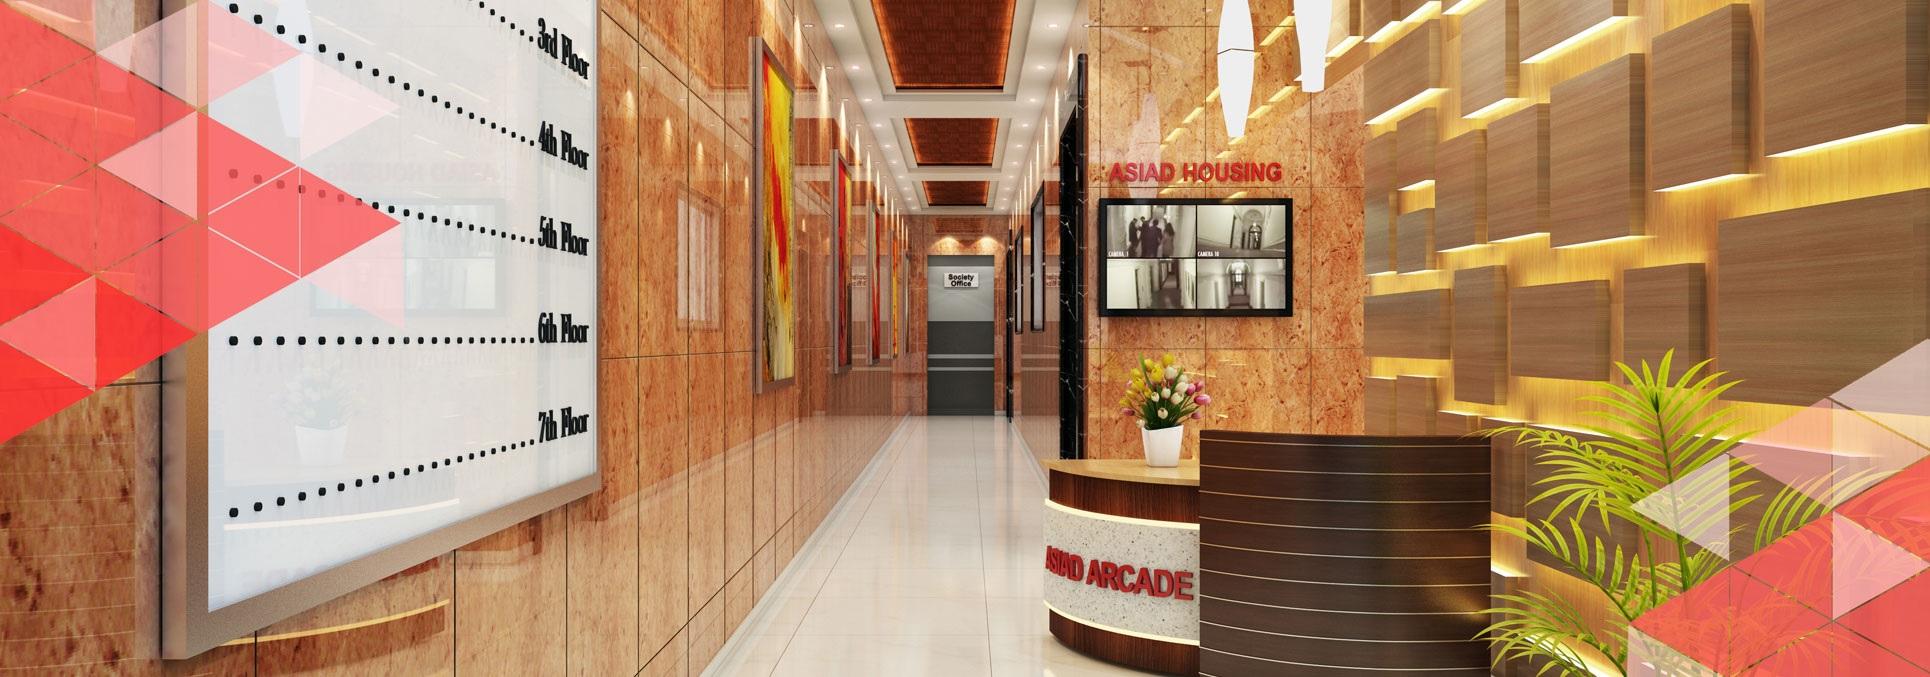 asiad arcade amenities features4